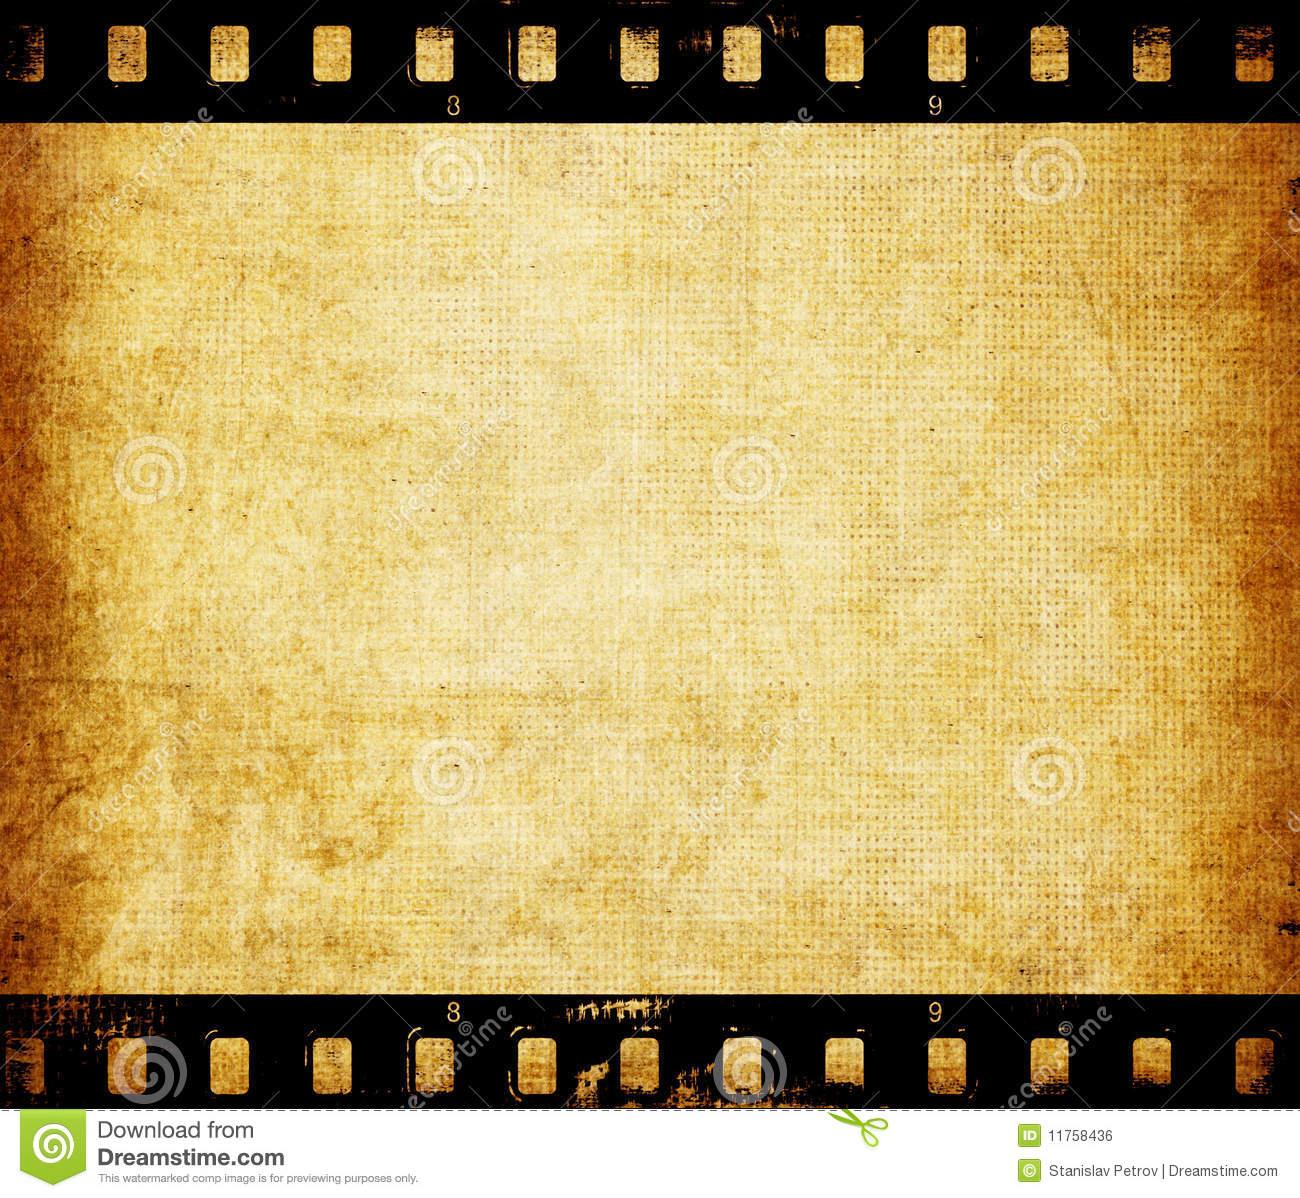 Best 48 Film Backgrounds on HipWallpaper Film Wallpapers 1300x1198